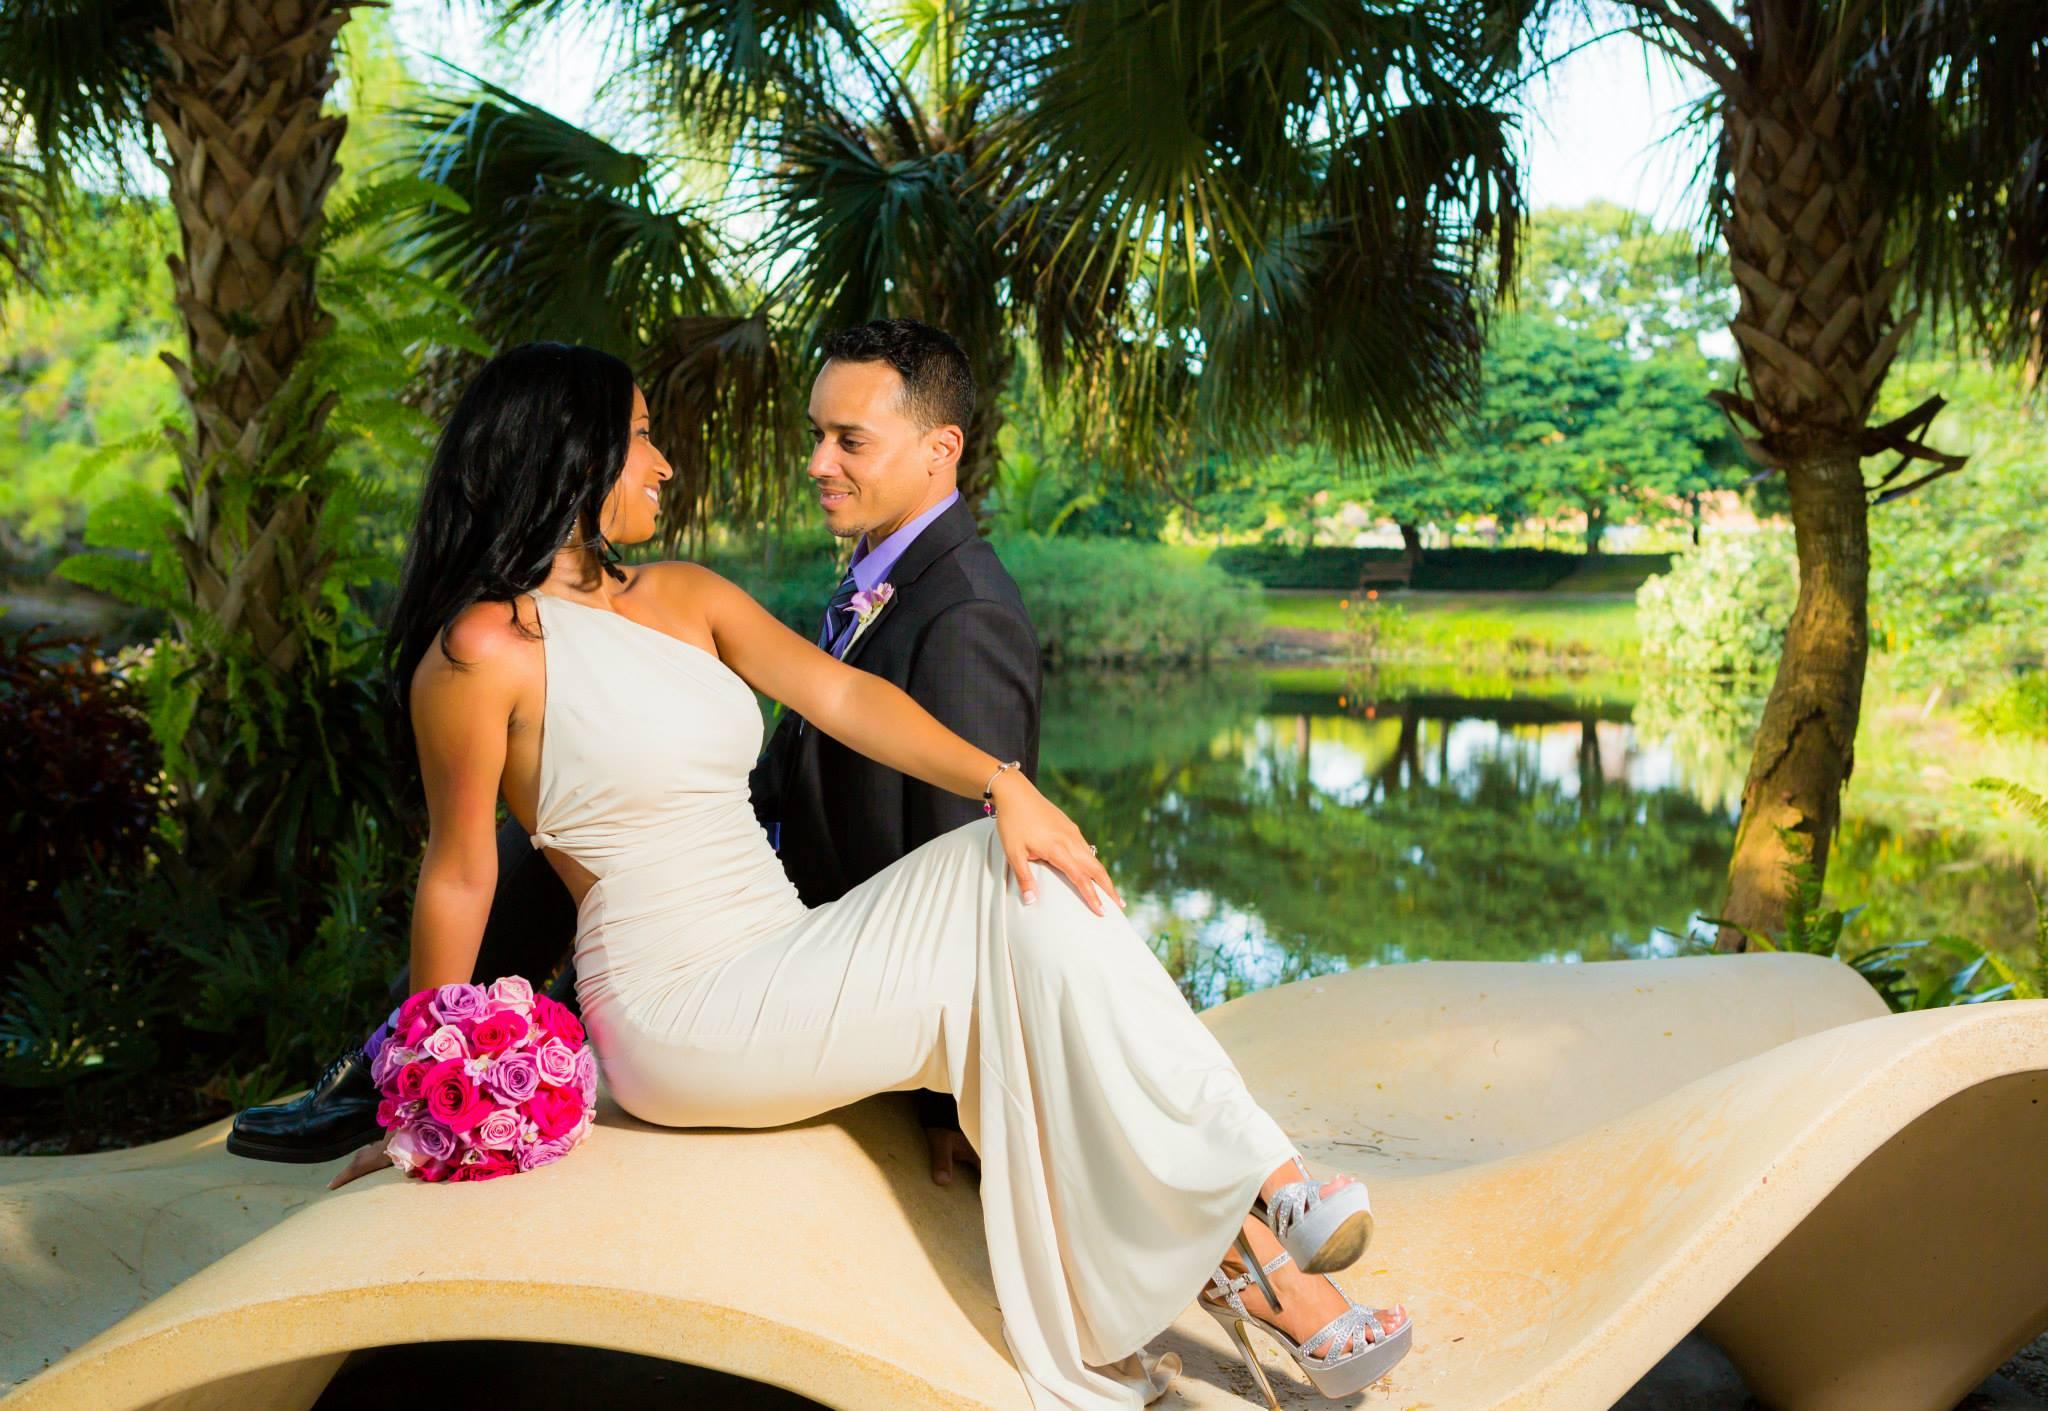 Need a palm Beach Wedding Photographer for your Palm Beach County Wedding